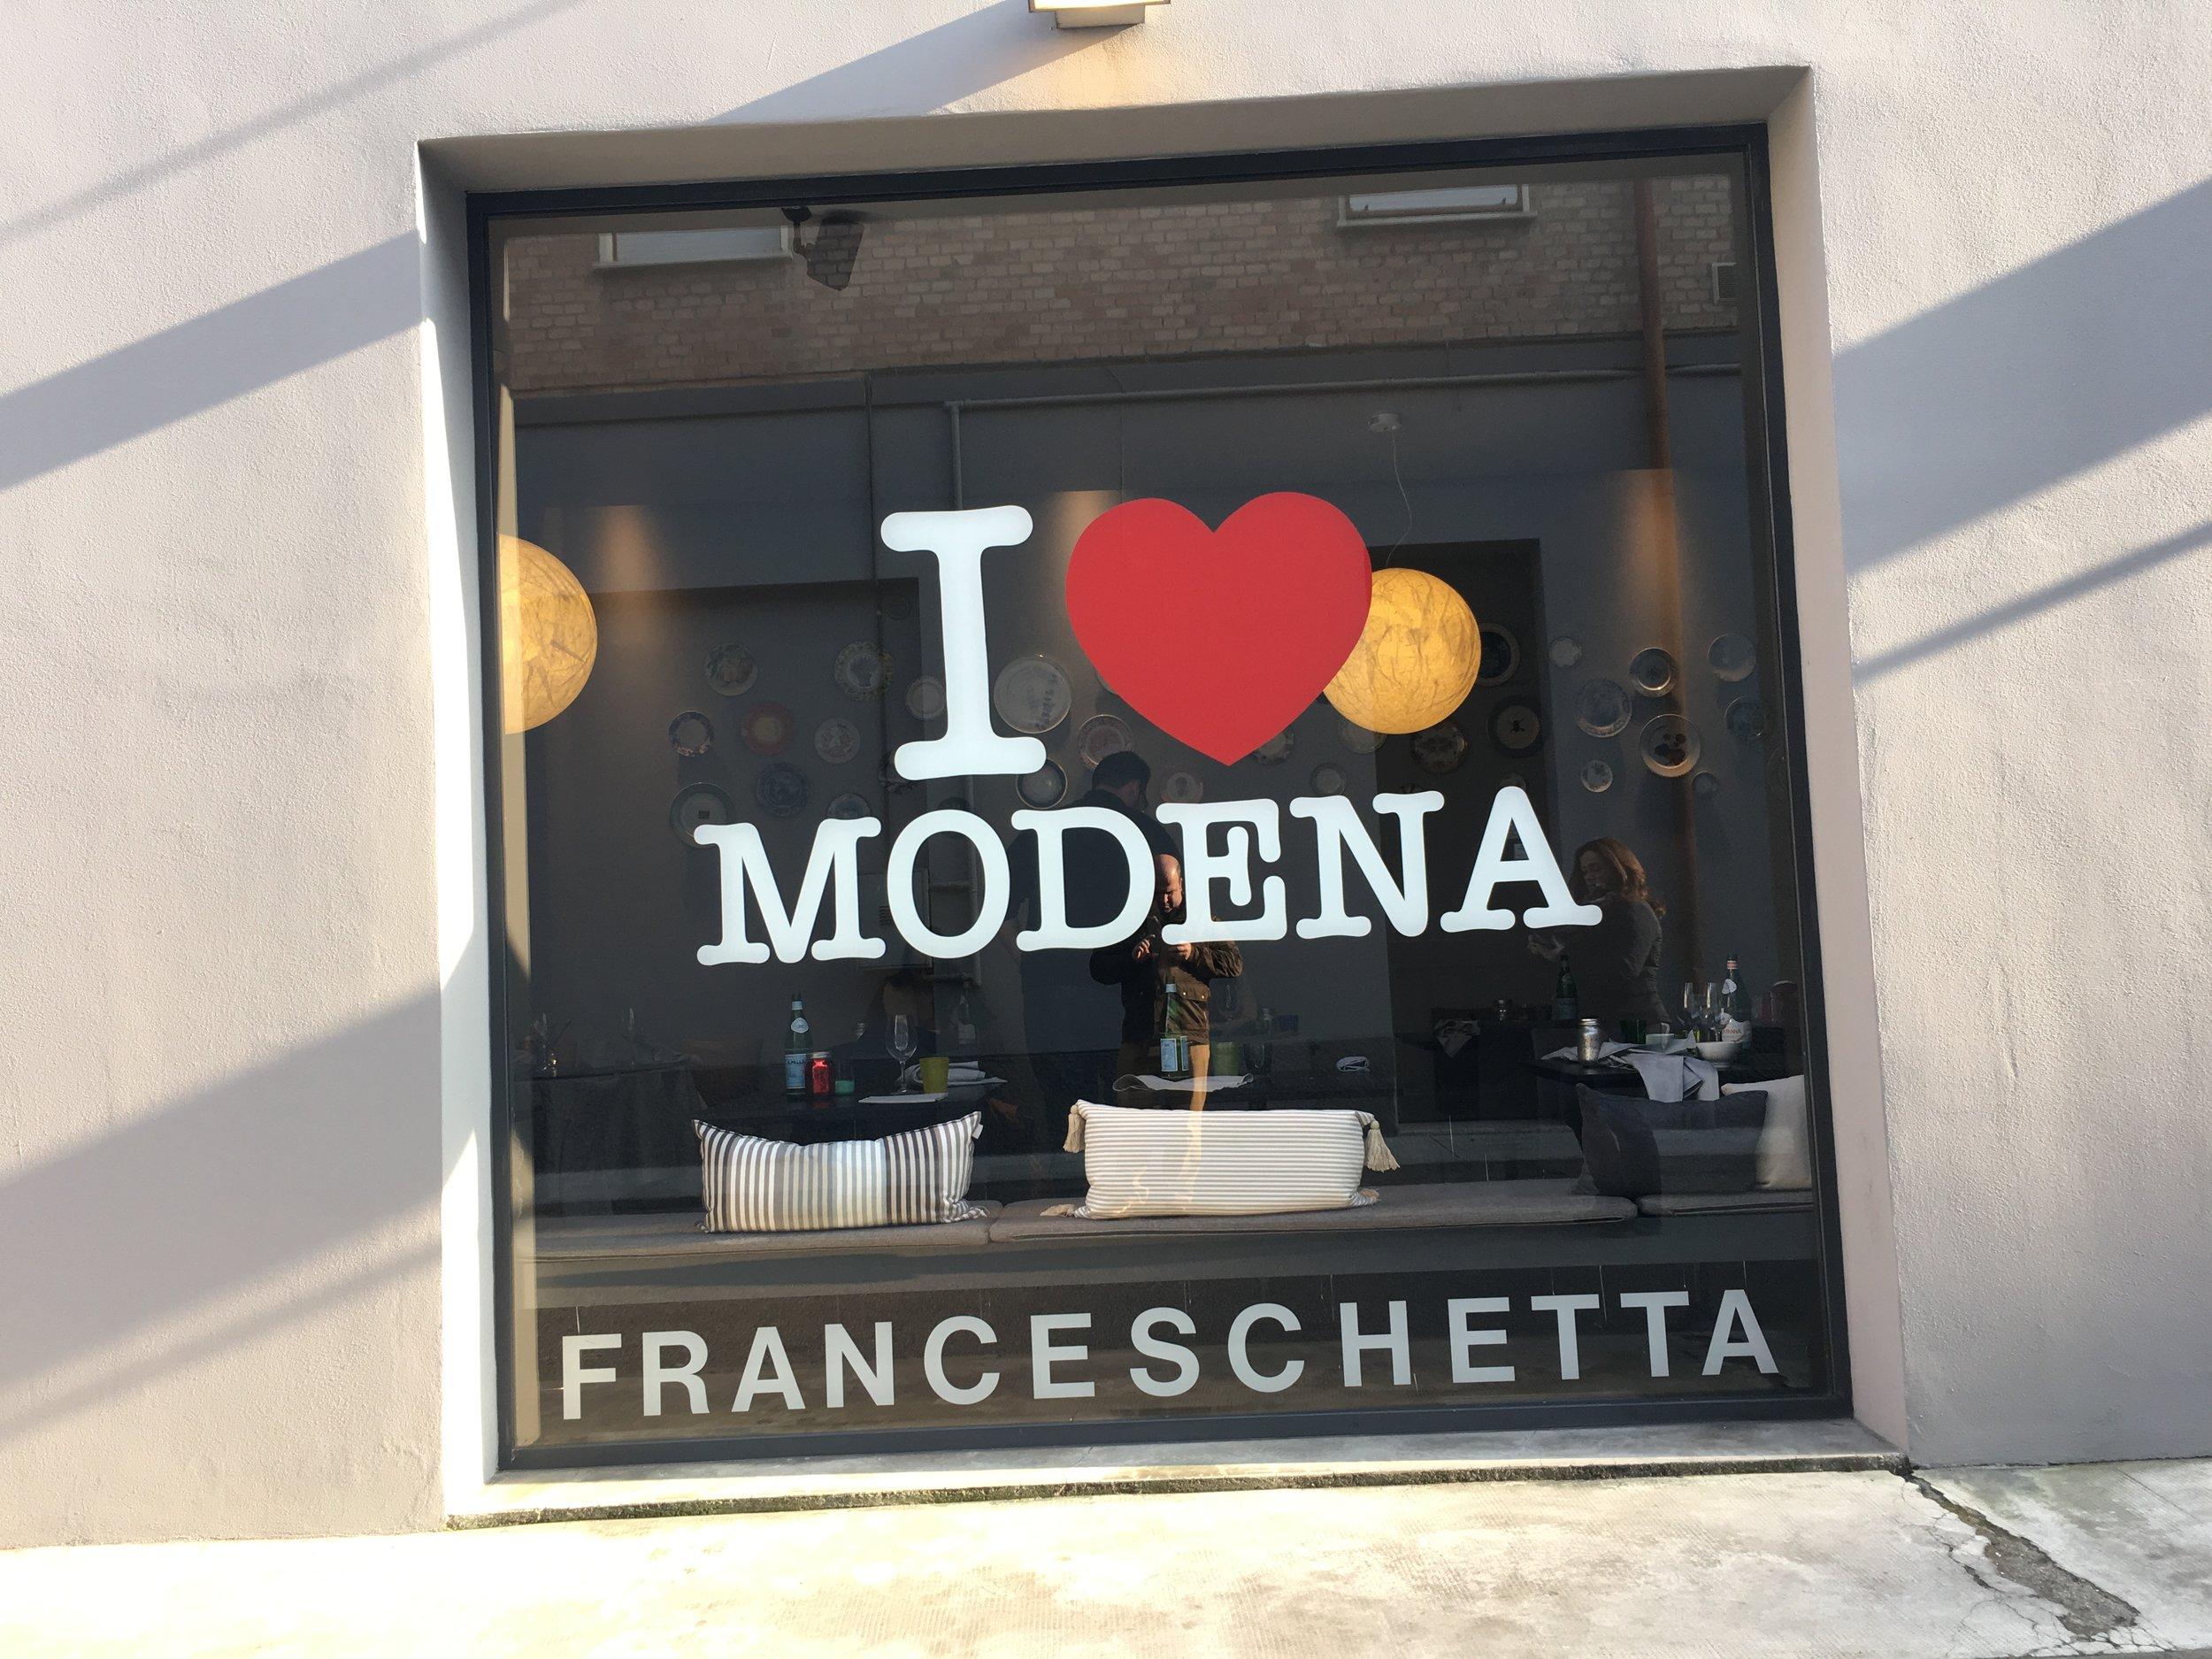 I_love_modena_mastro_scheidt